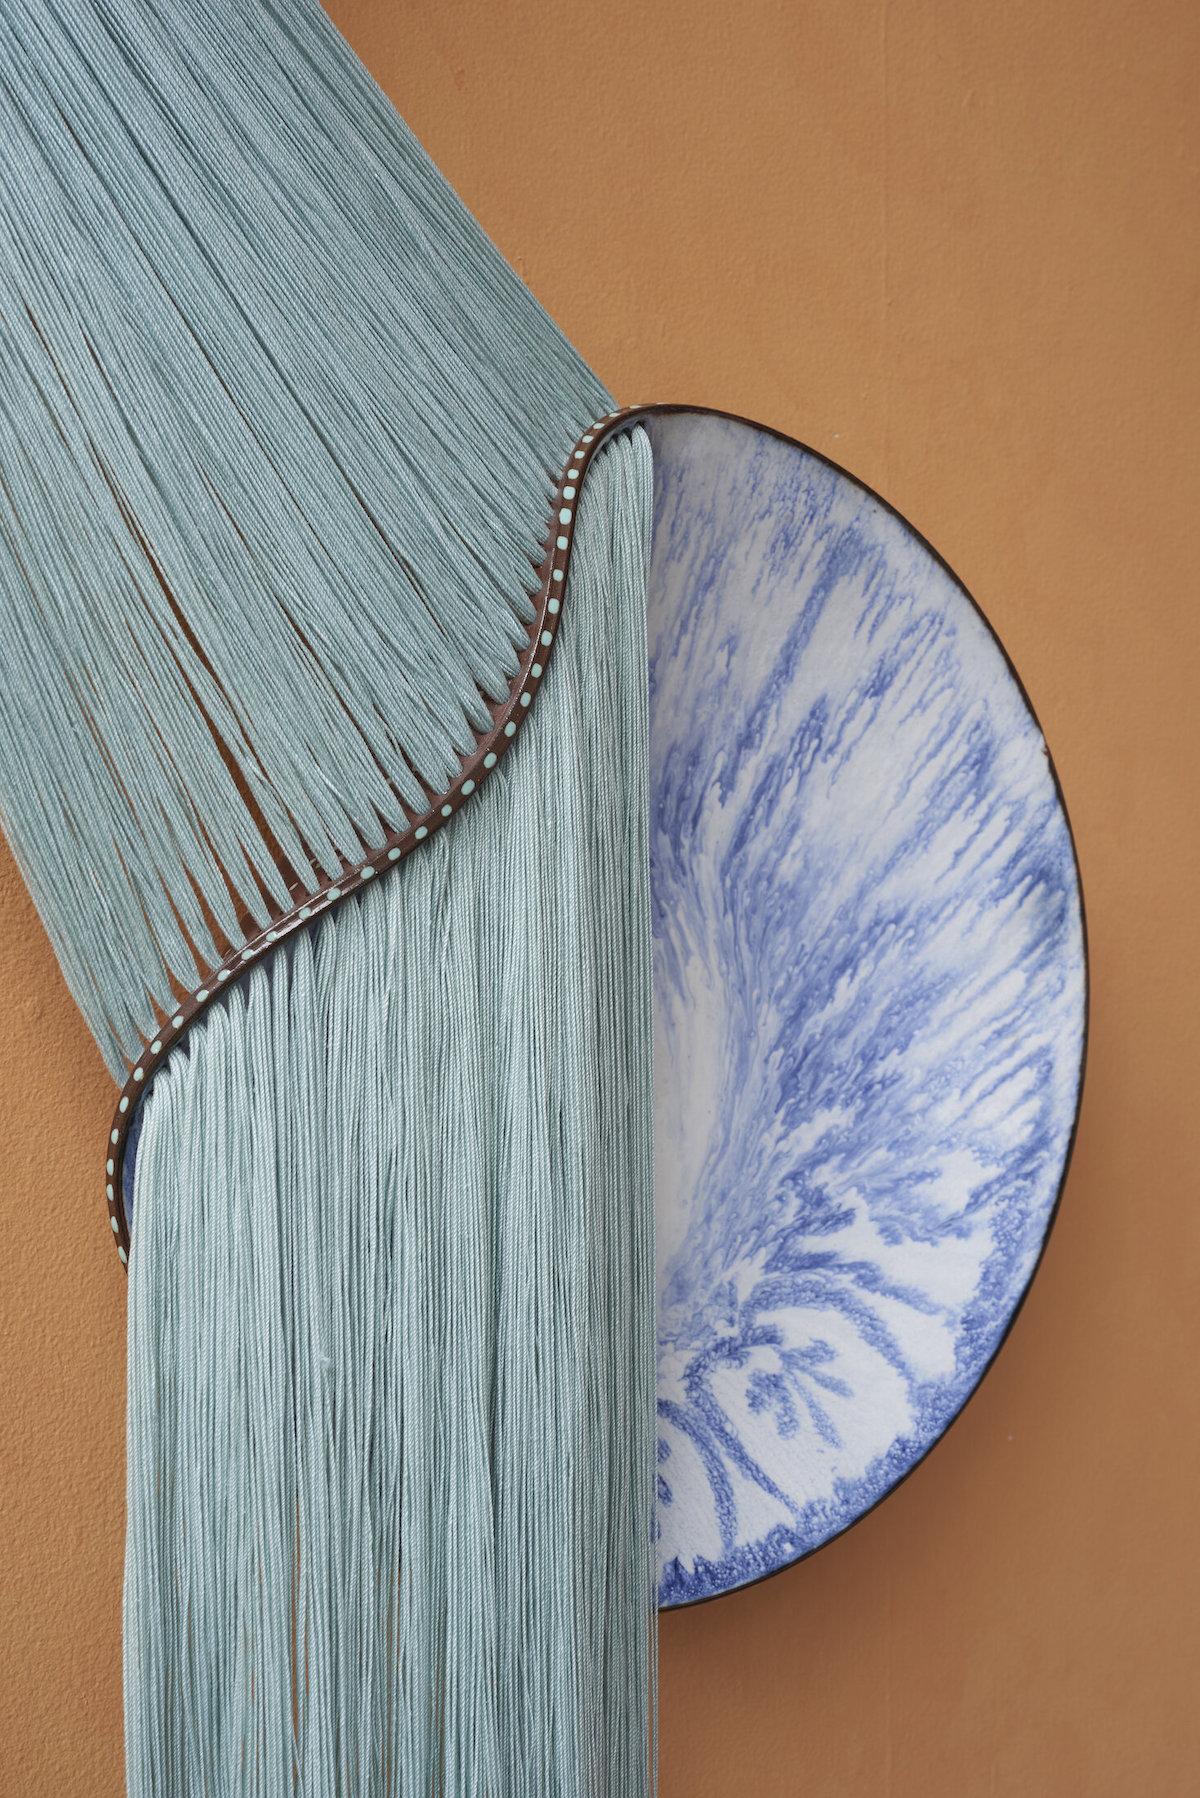 Nicole Mclaughlin Ceramic and Fiber Sculpture